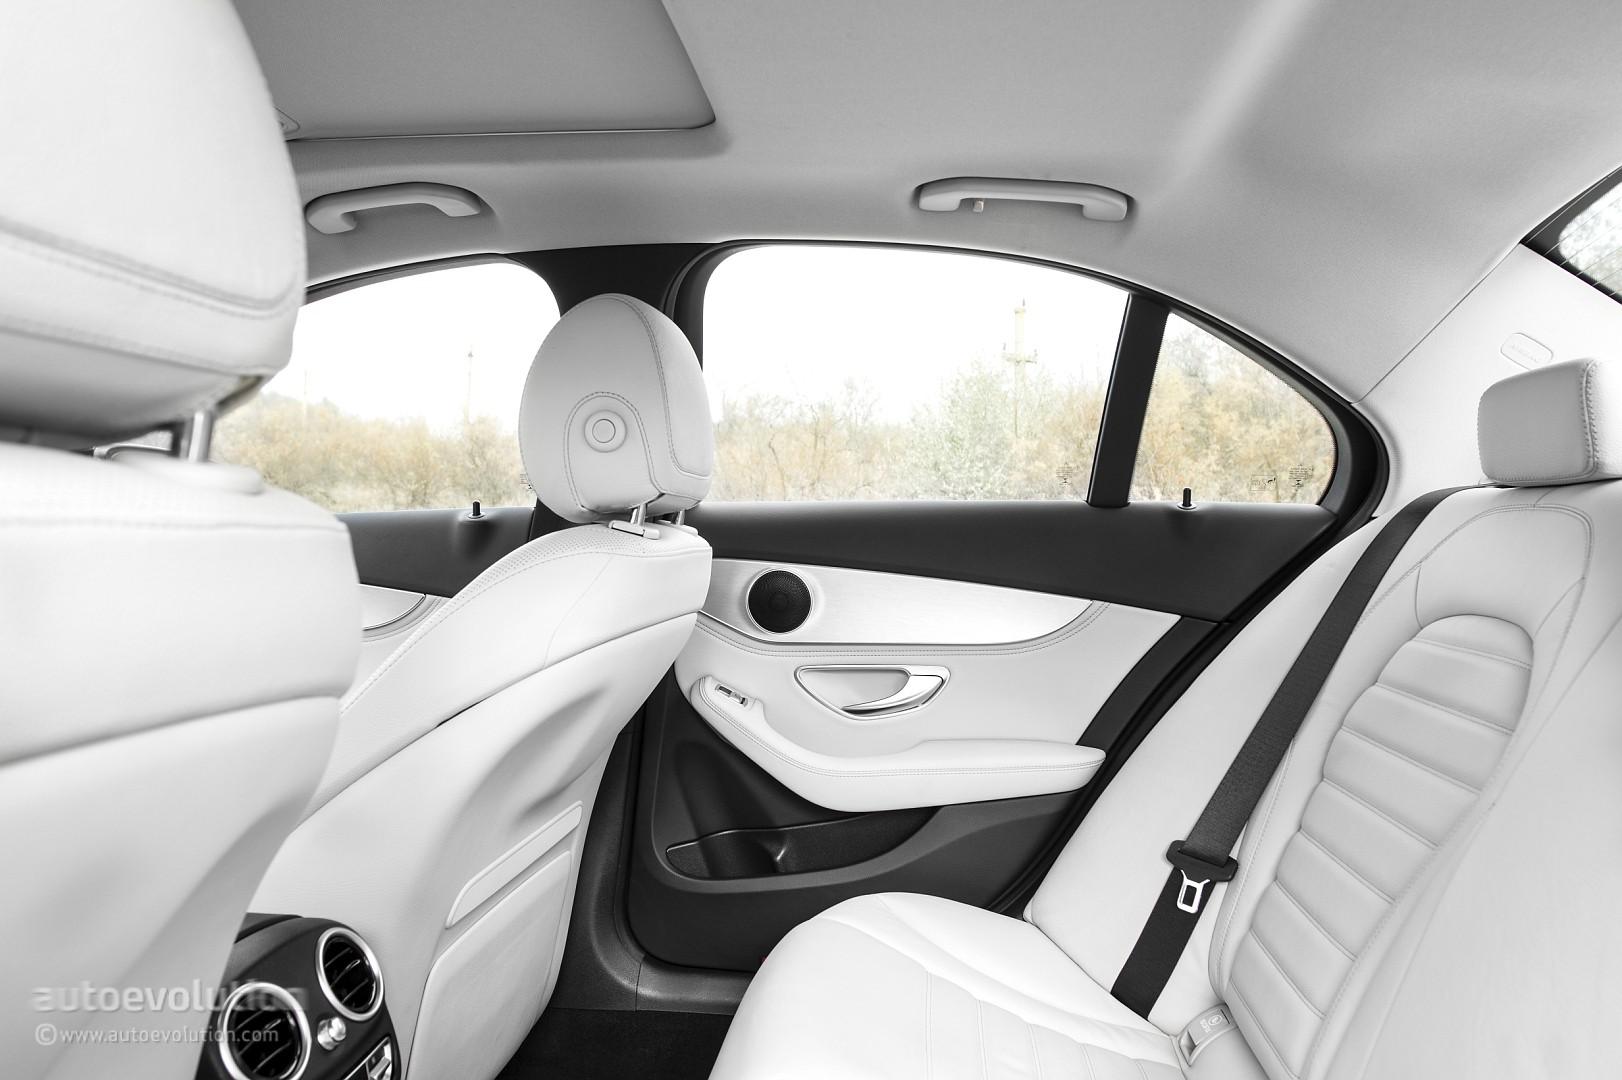 2015 mercedes benz c class review autoevolution for Mercedes benz c class 2015 interior